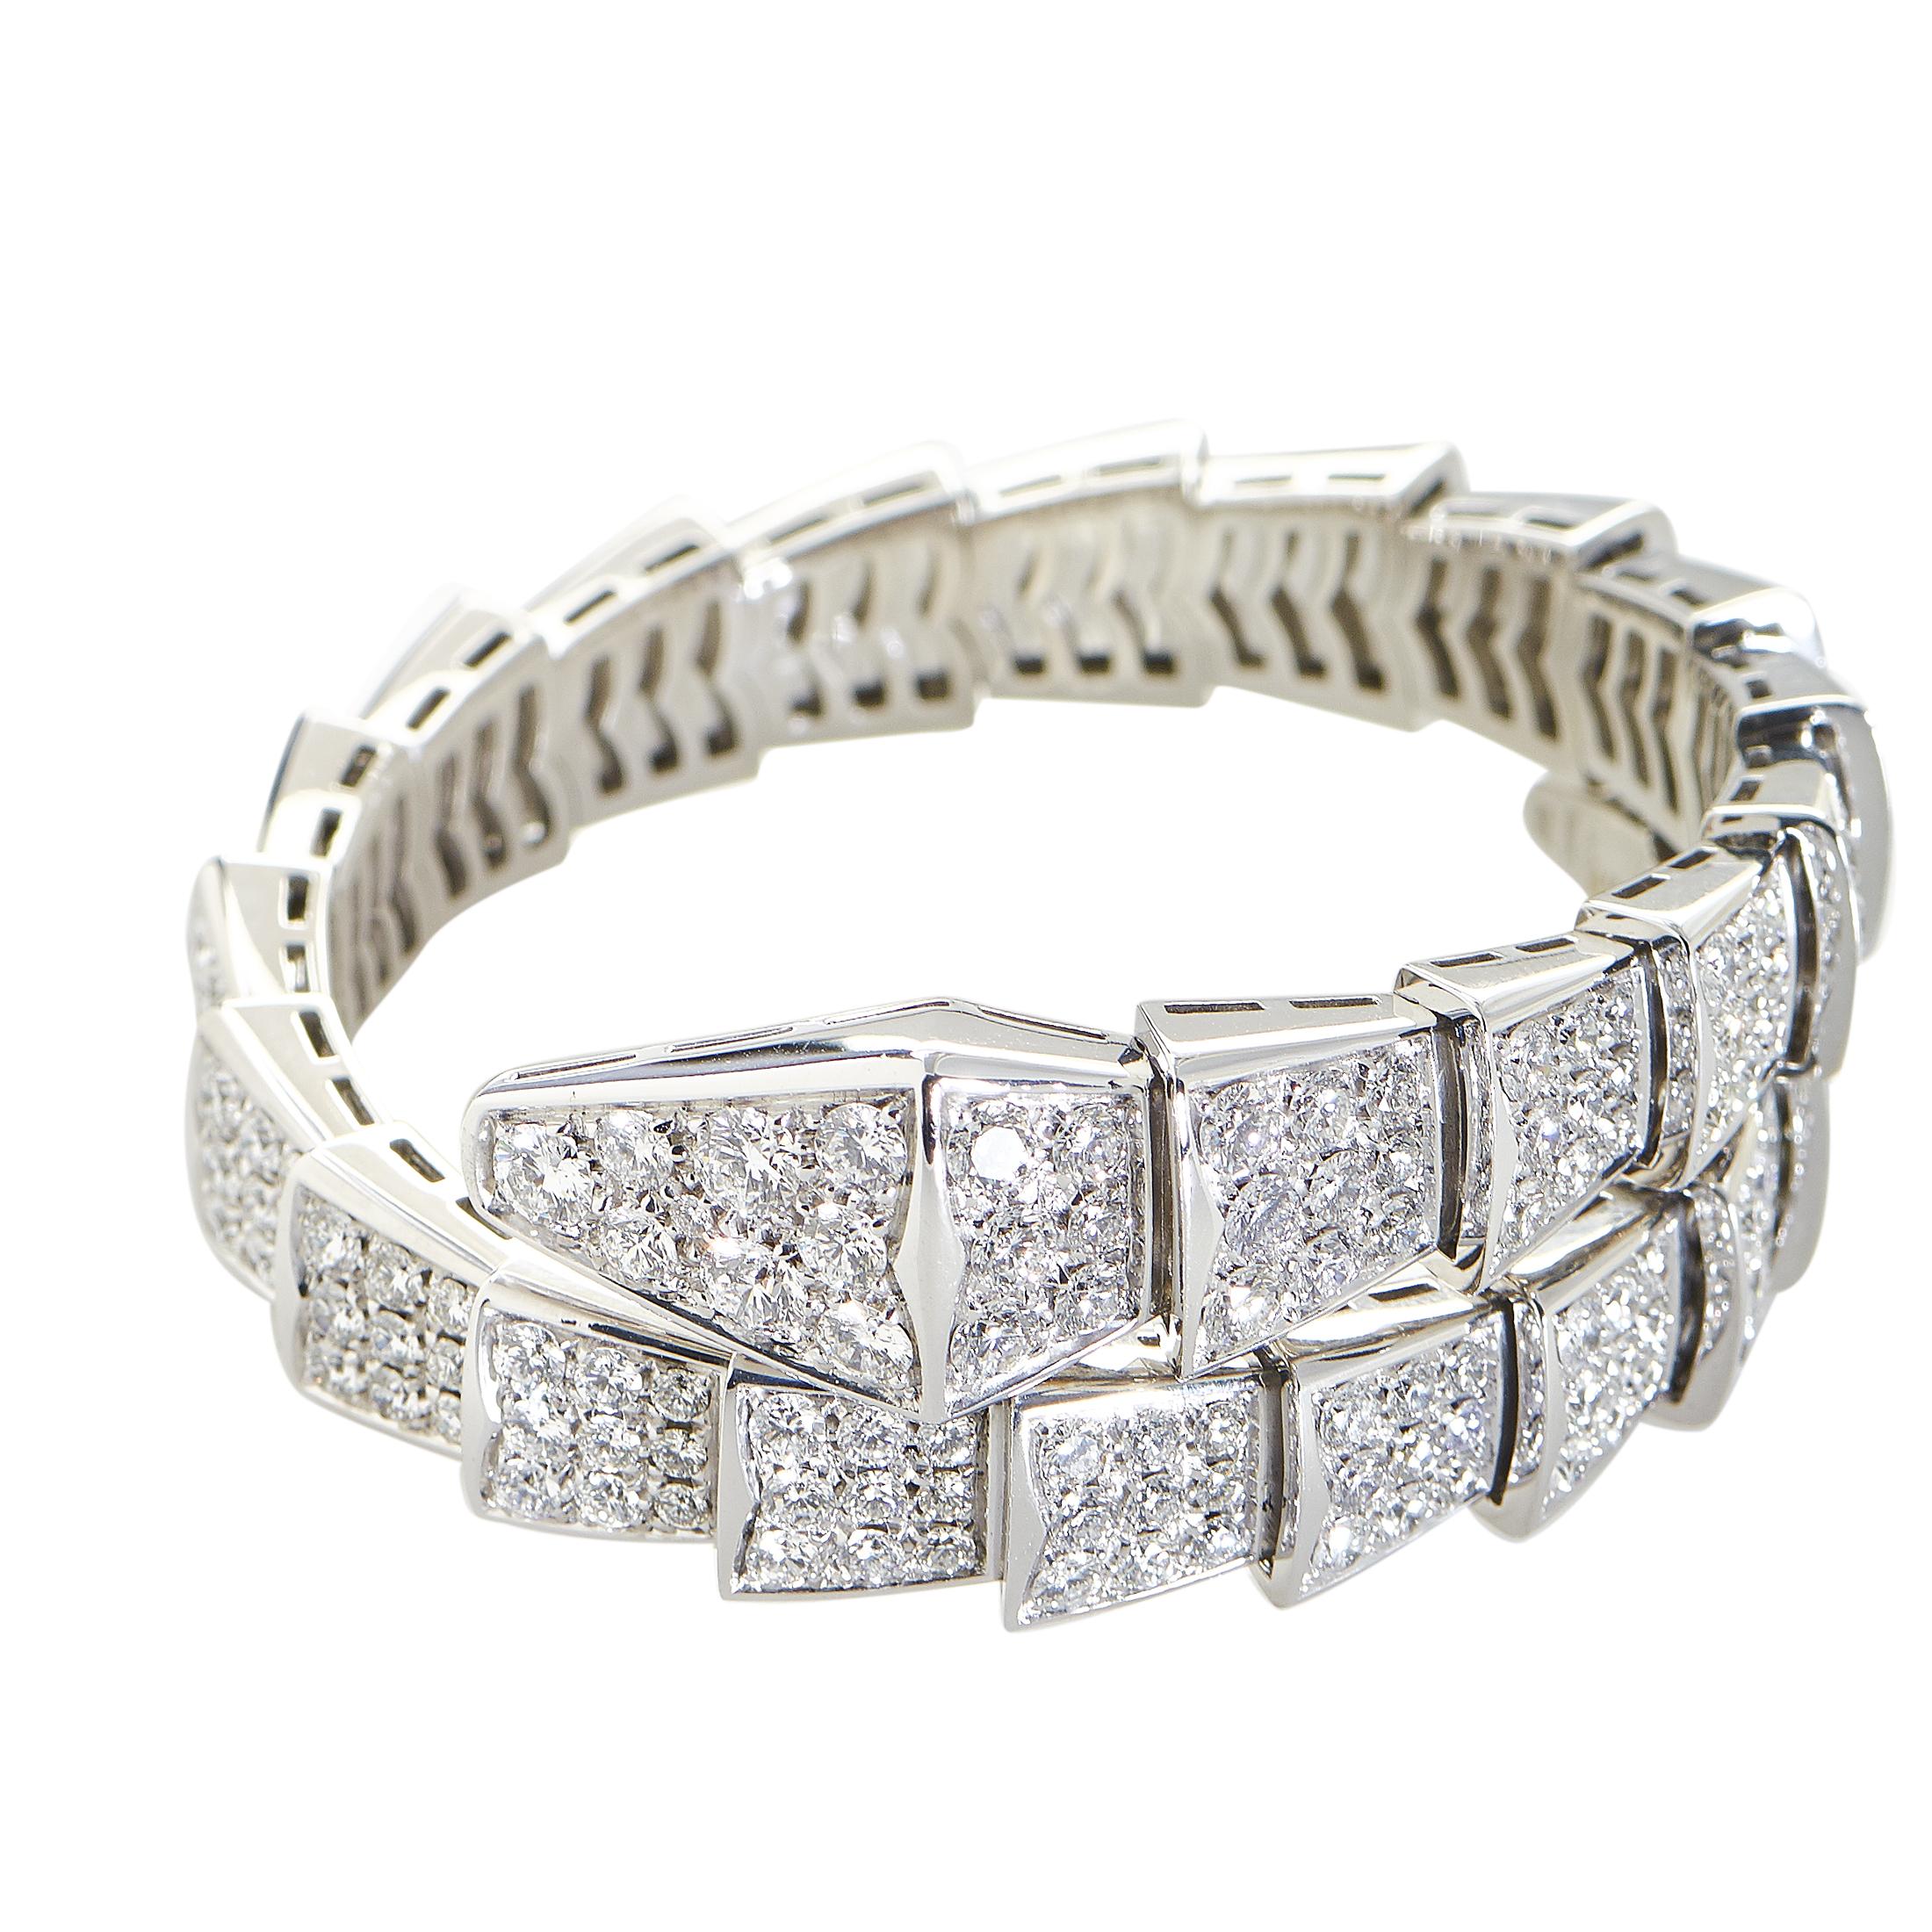 Serpenti Womens 18K White Gold Full Diamond Pave Small Bracelet